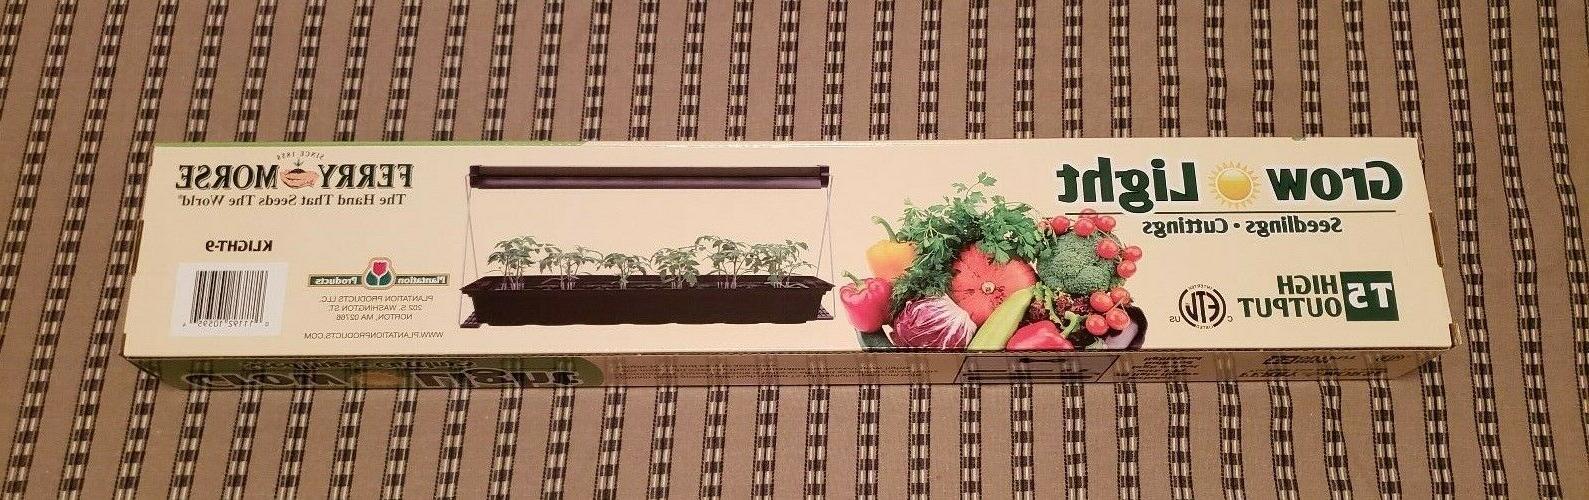 Ferry Indoor Grow 2ft stand